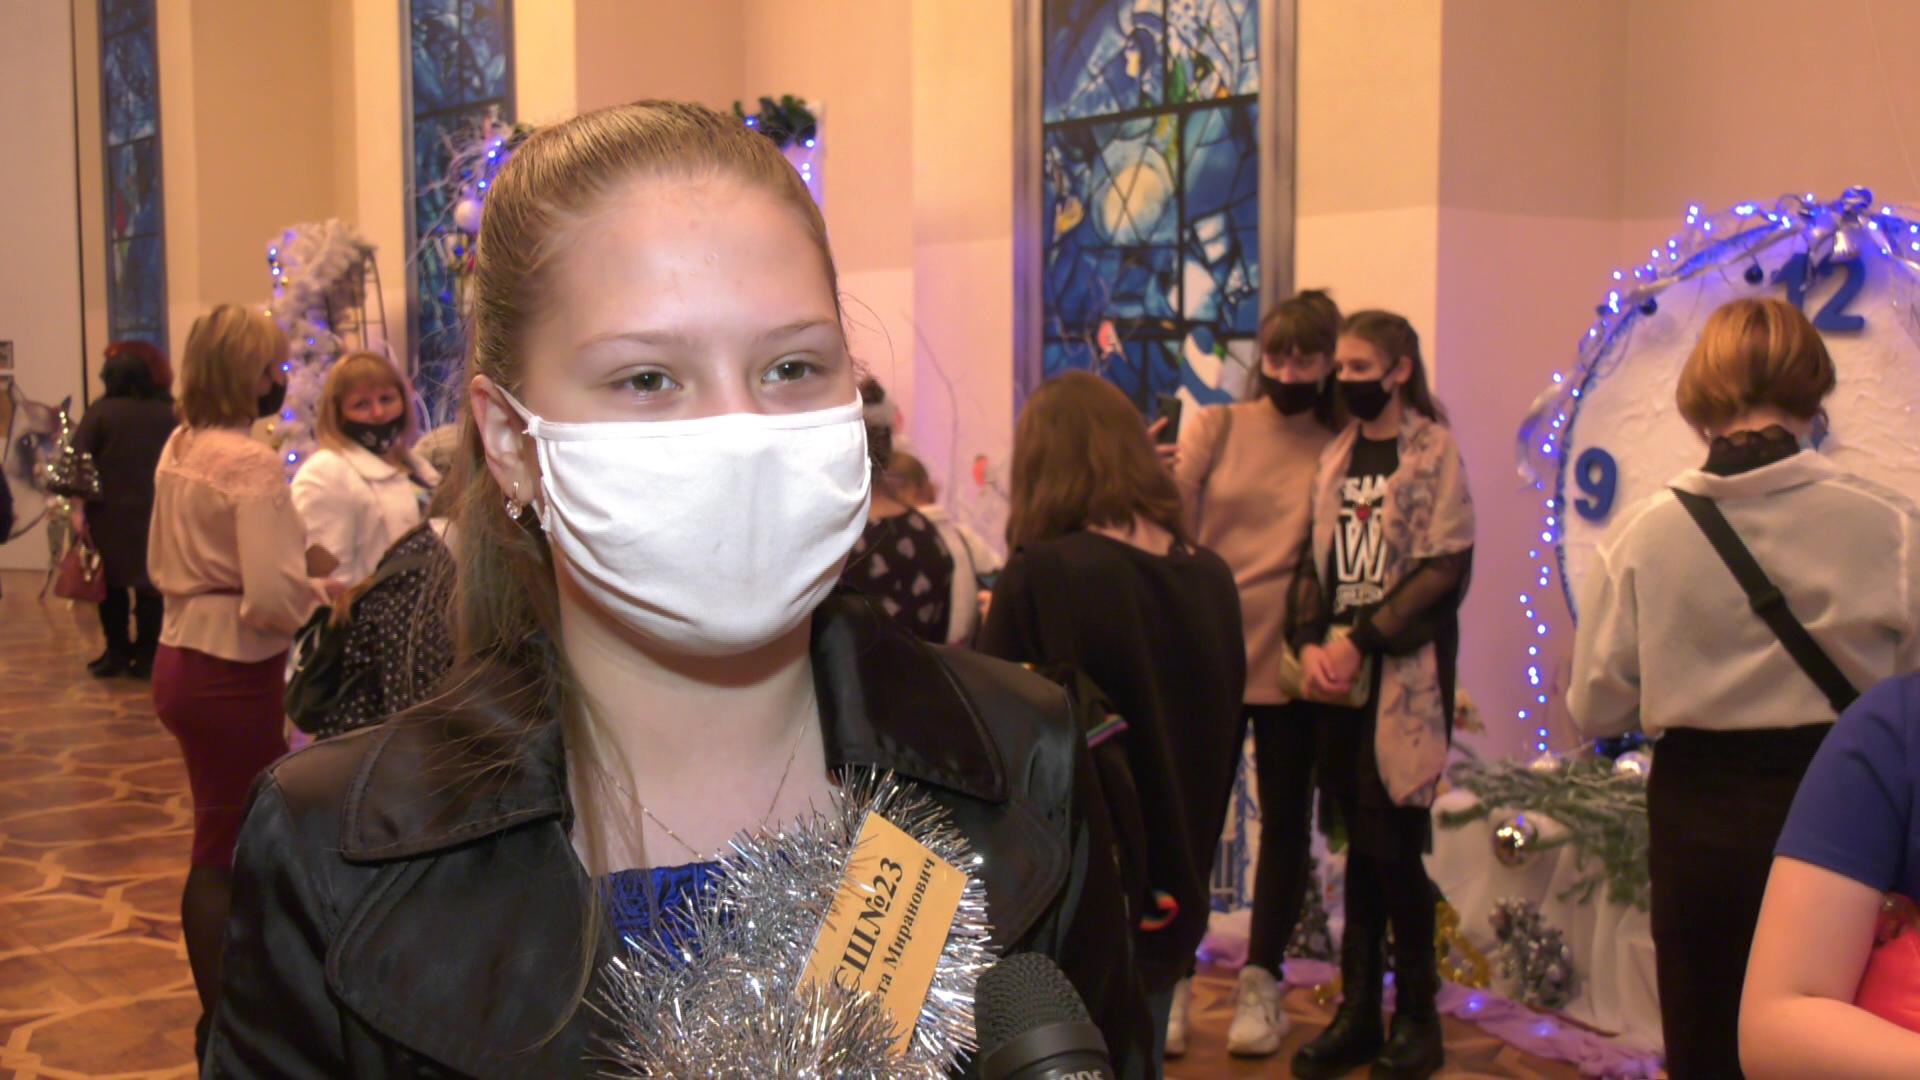 gubernatorskaja jolka - Дети со всей области приехали в Витебск на новогодний праздник (видео)